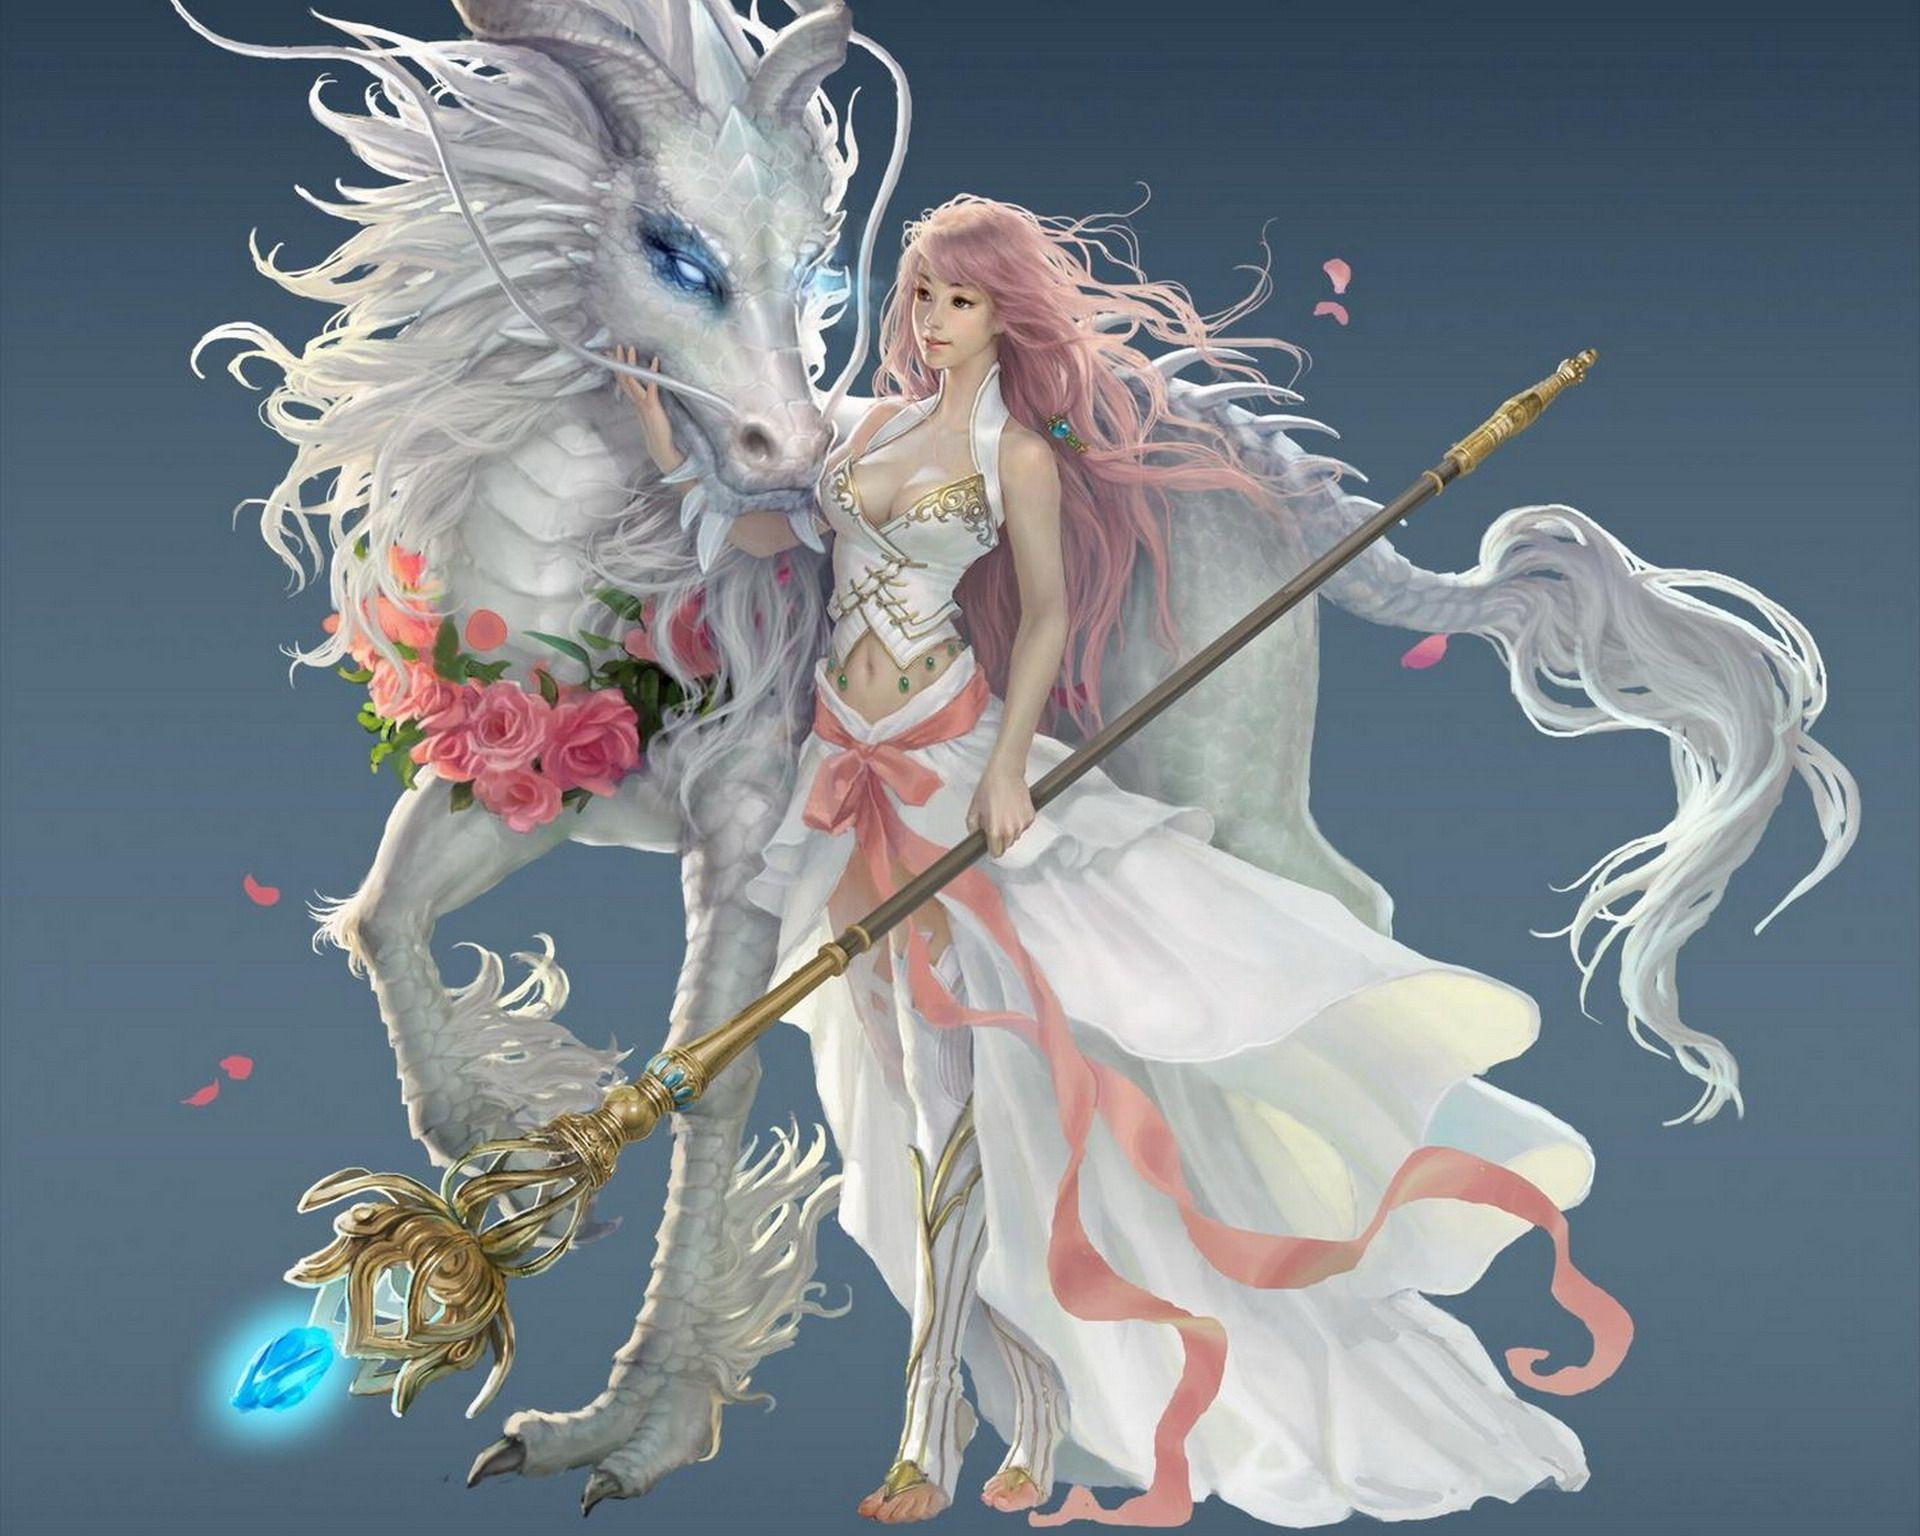 Best Wallpaper Horse Magic - f1197af0e4b23938572cc6202afc1af4  Graphic_267178.jpg